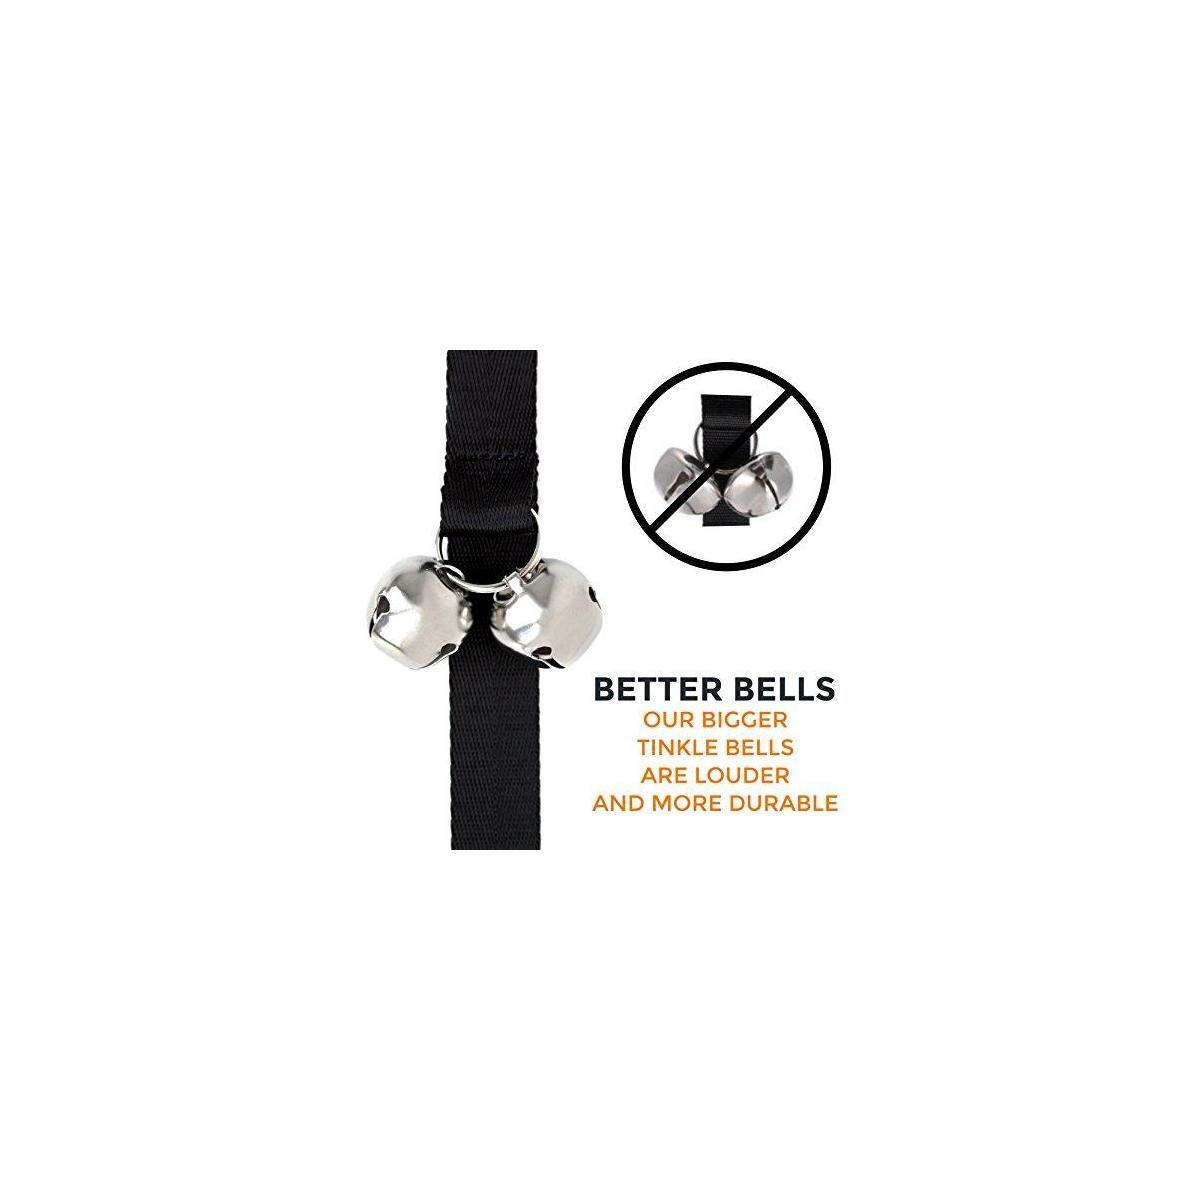 Mighty Paw Tinkle Bells, Premium Quality Dog Doorbells, Housetraining Doggy Door Bells for Potty Training